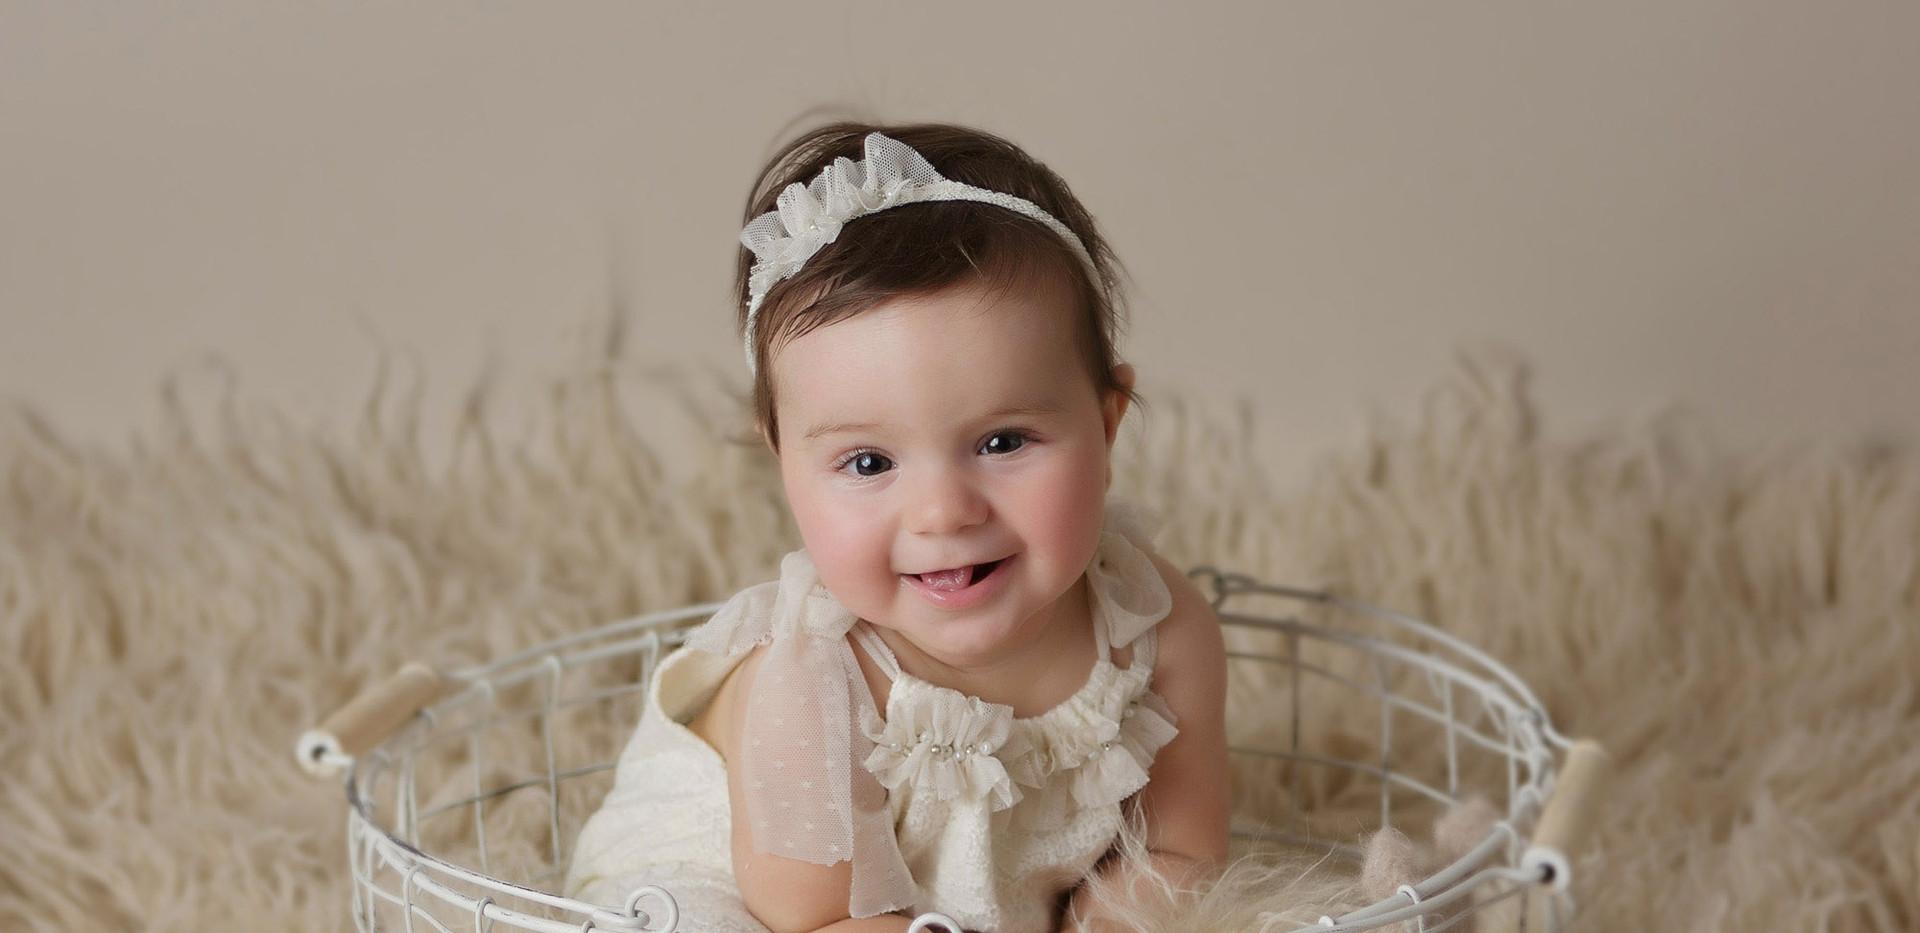 baby-photography-milestone-wire-basket-f